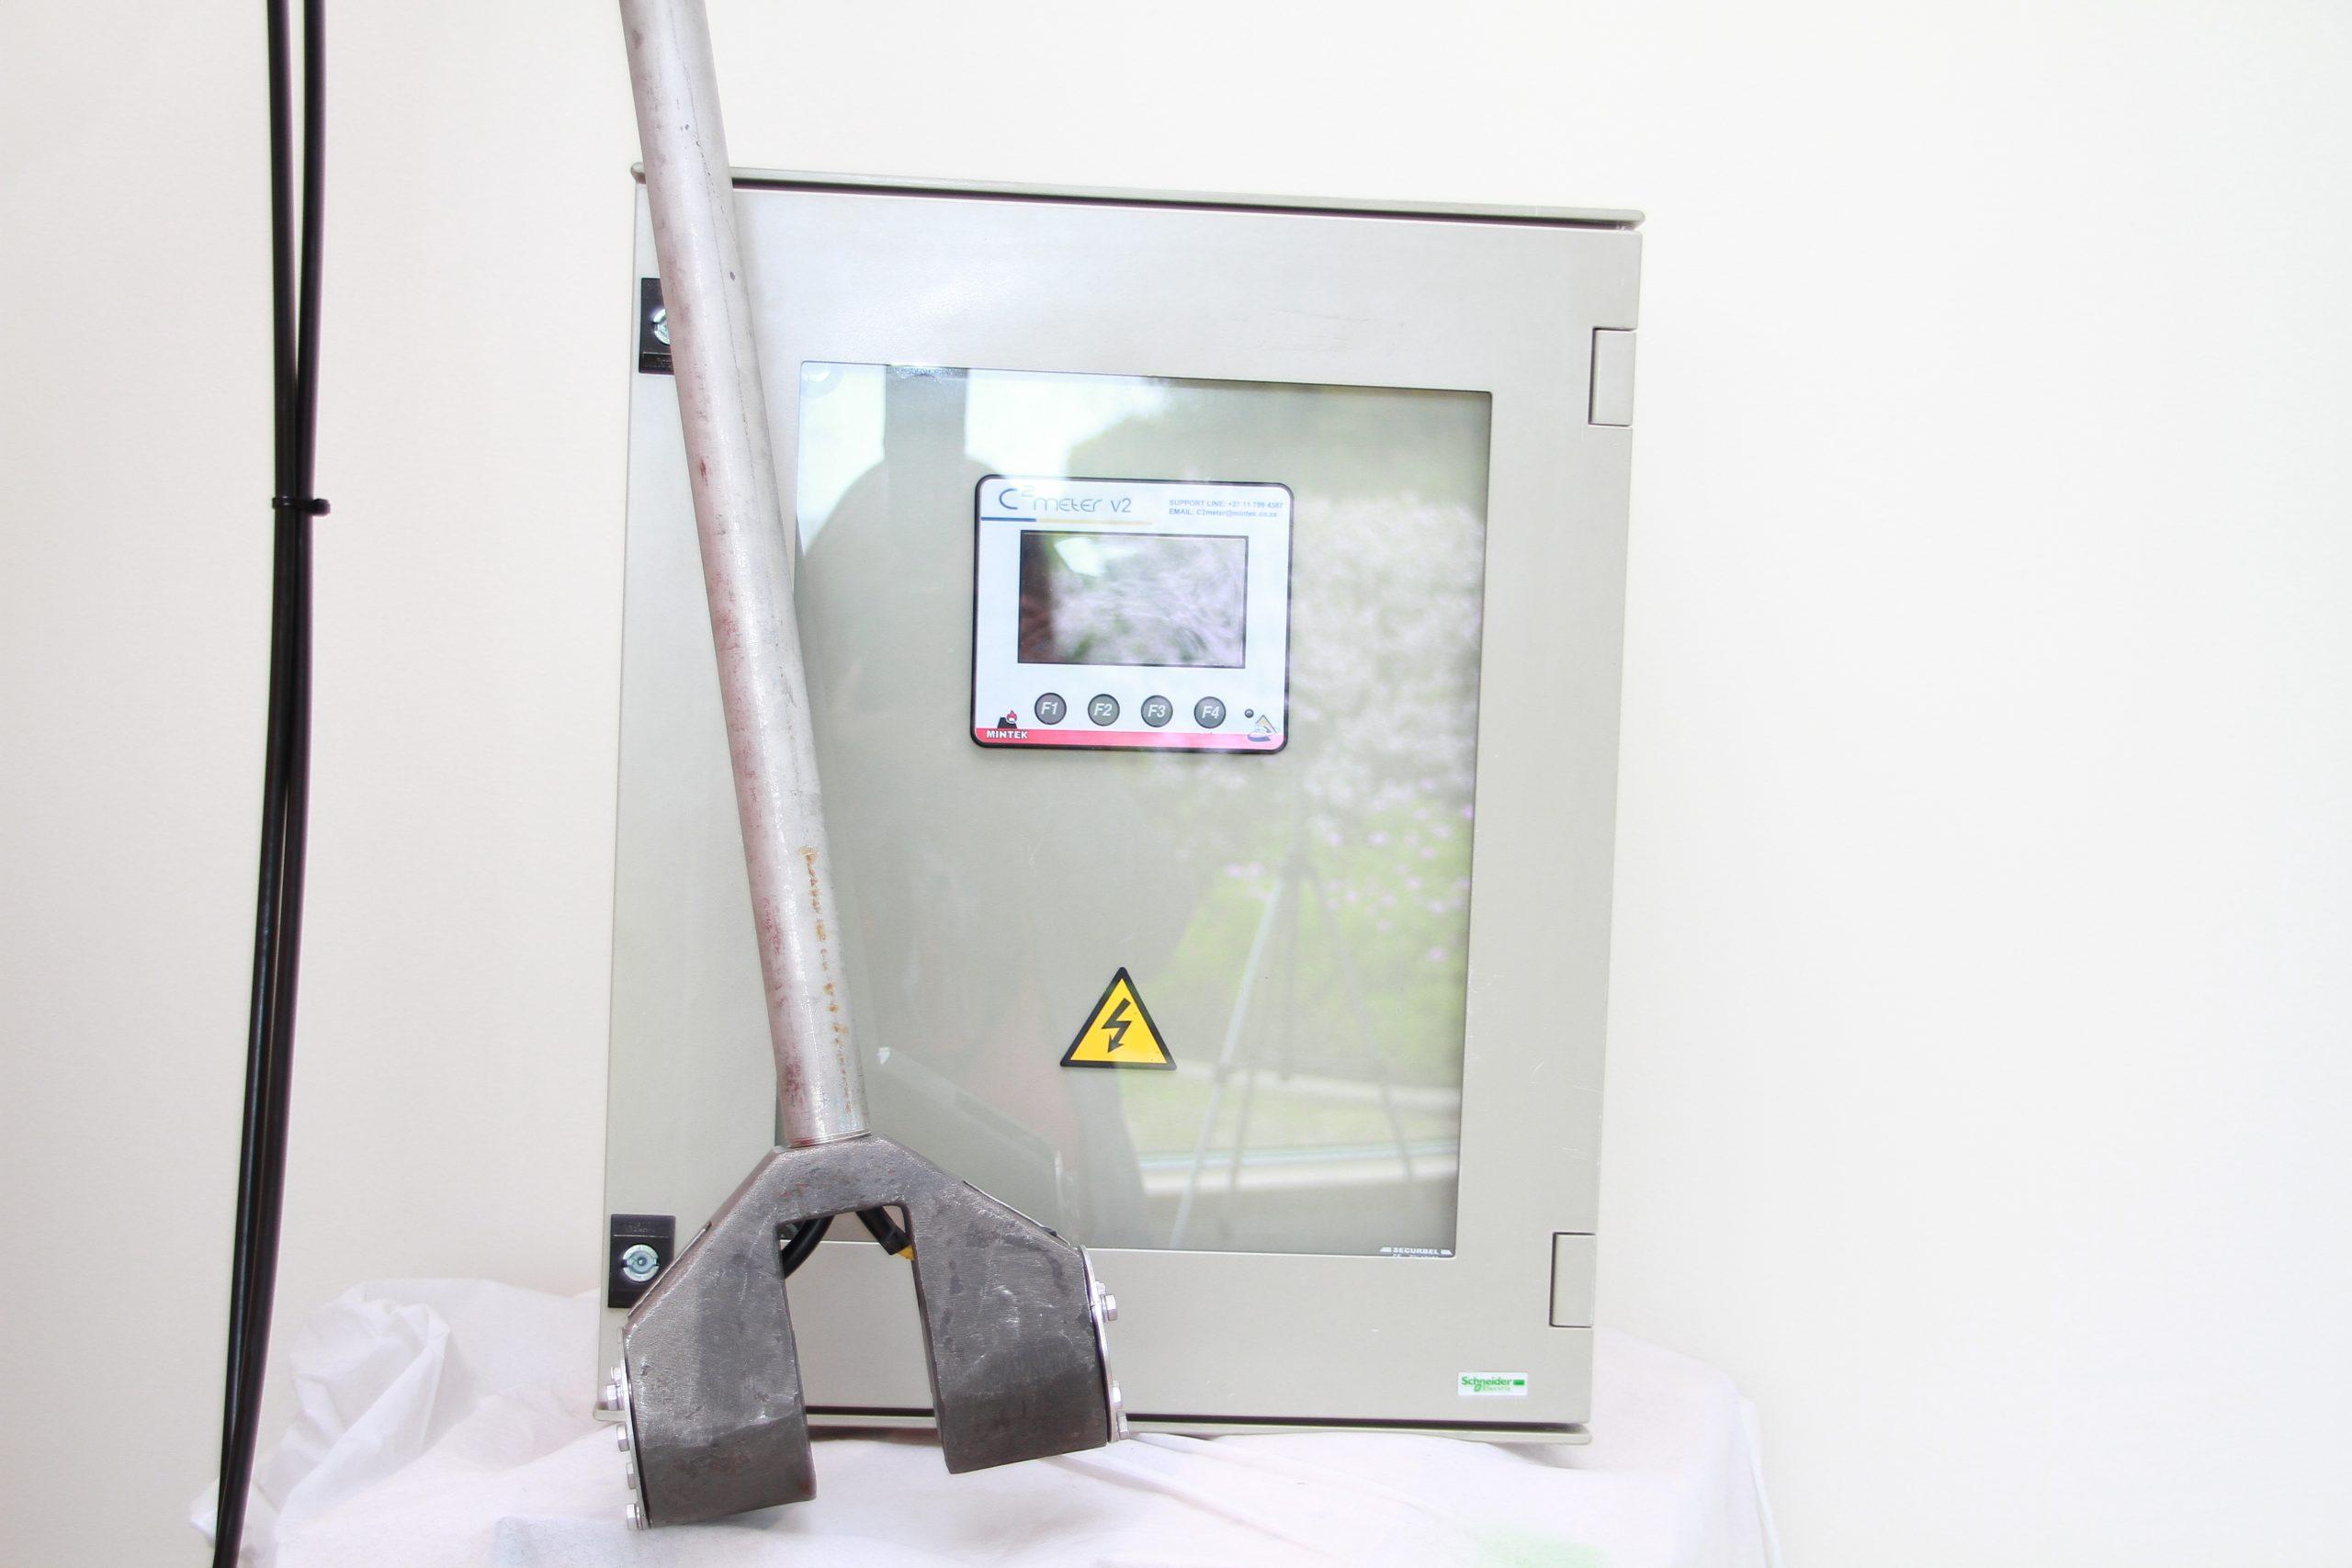 C2 Meter online carbon measurement